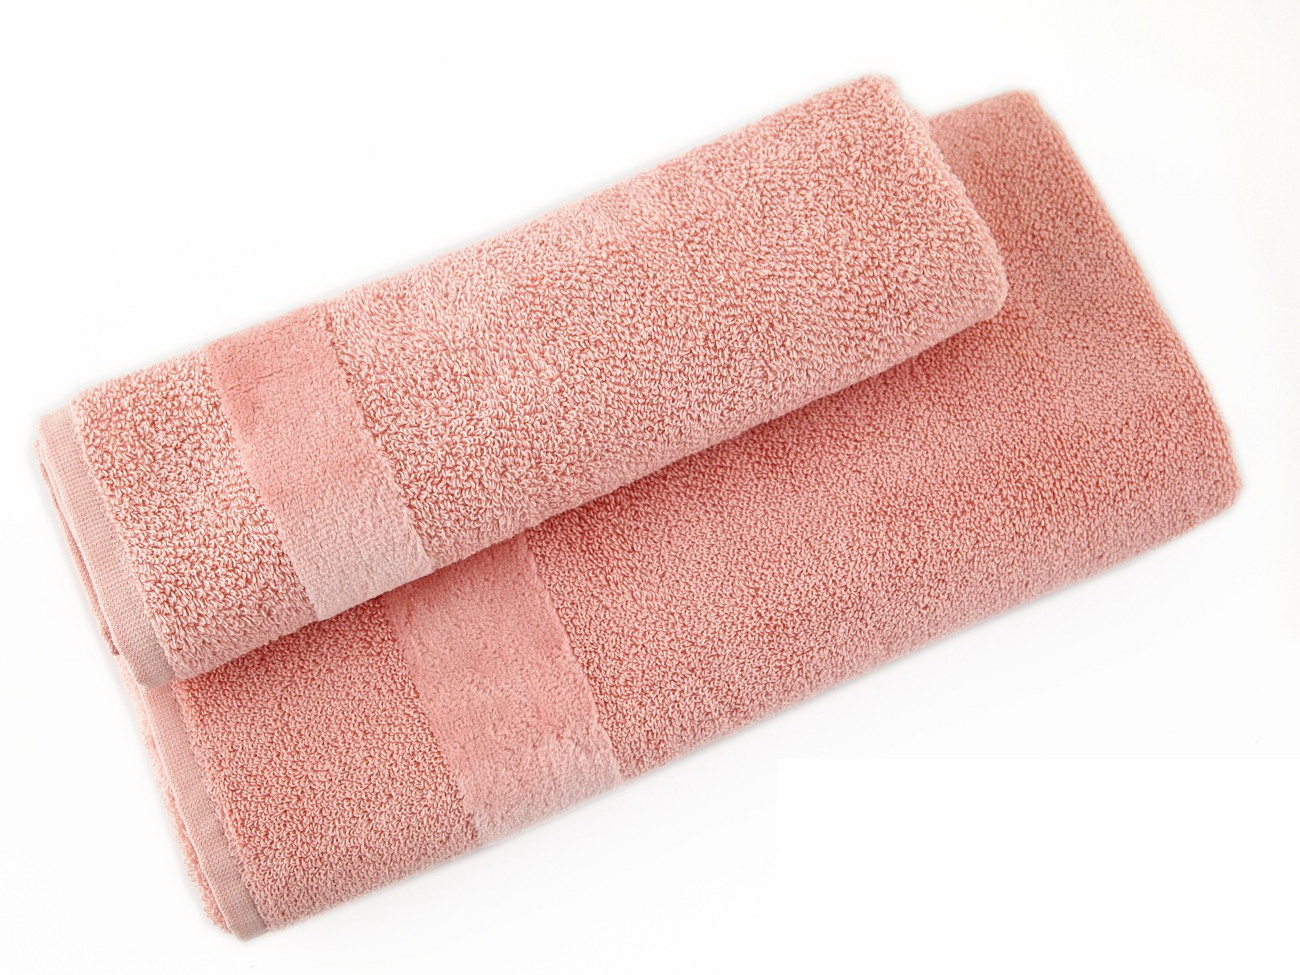 Ванная Полотенце 100х160 Carrara Fyber светло-розовое elitnye-polotentsa-mahrovye-fyber-504-svetlo-rozovye-ot-carrara-italiya.JPG